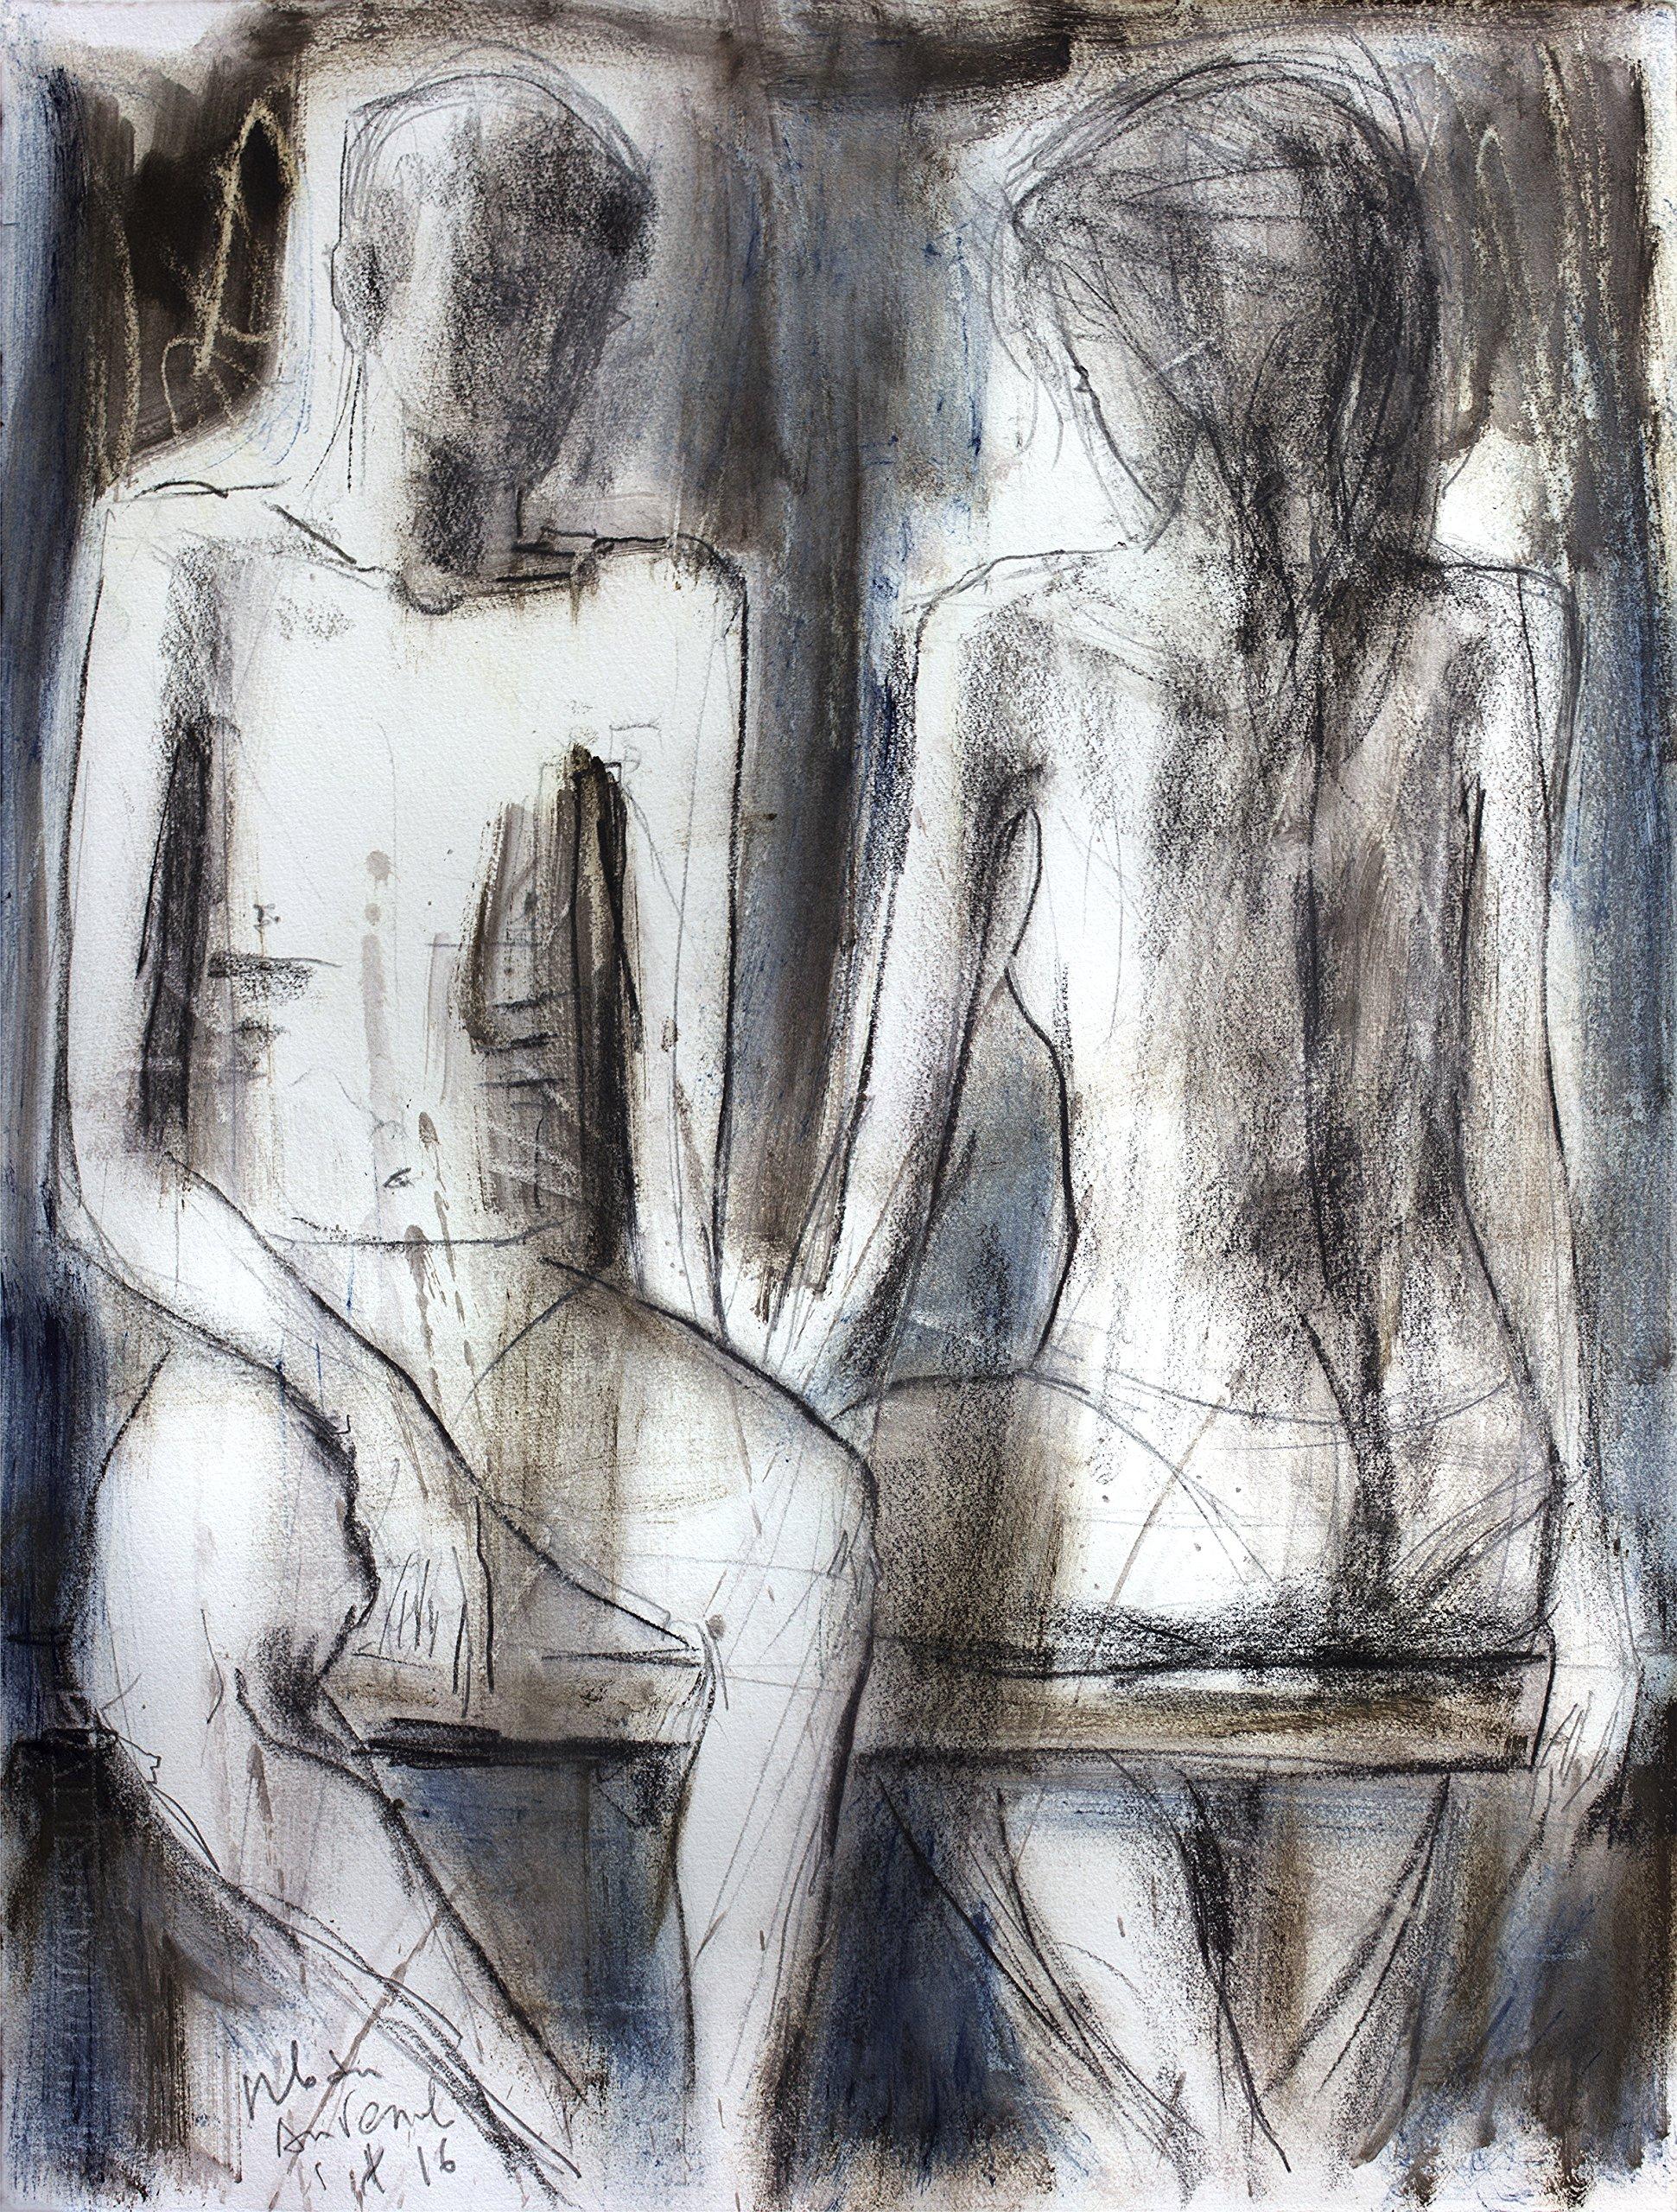 Couple Charcoal drawing Original Artistic sketch Nude Modern Figurative graphic art Woman Wall decor